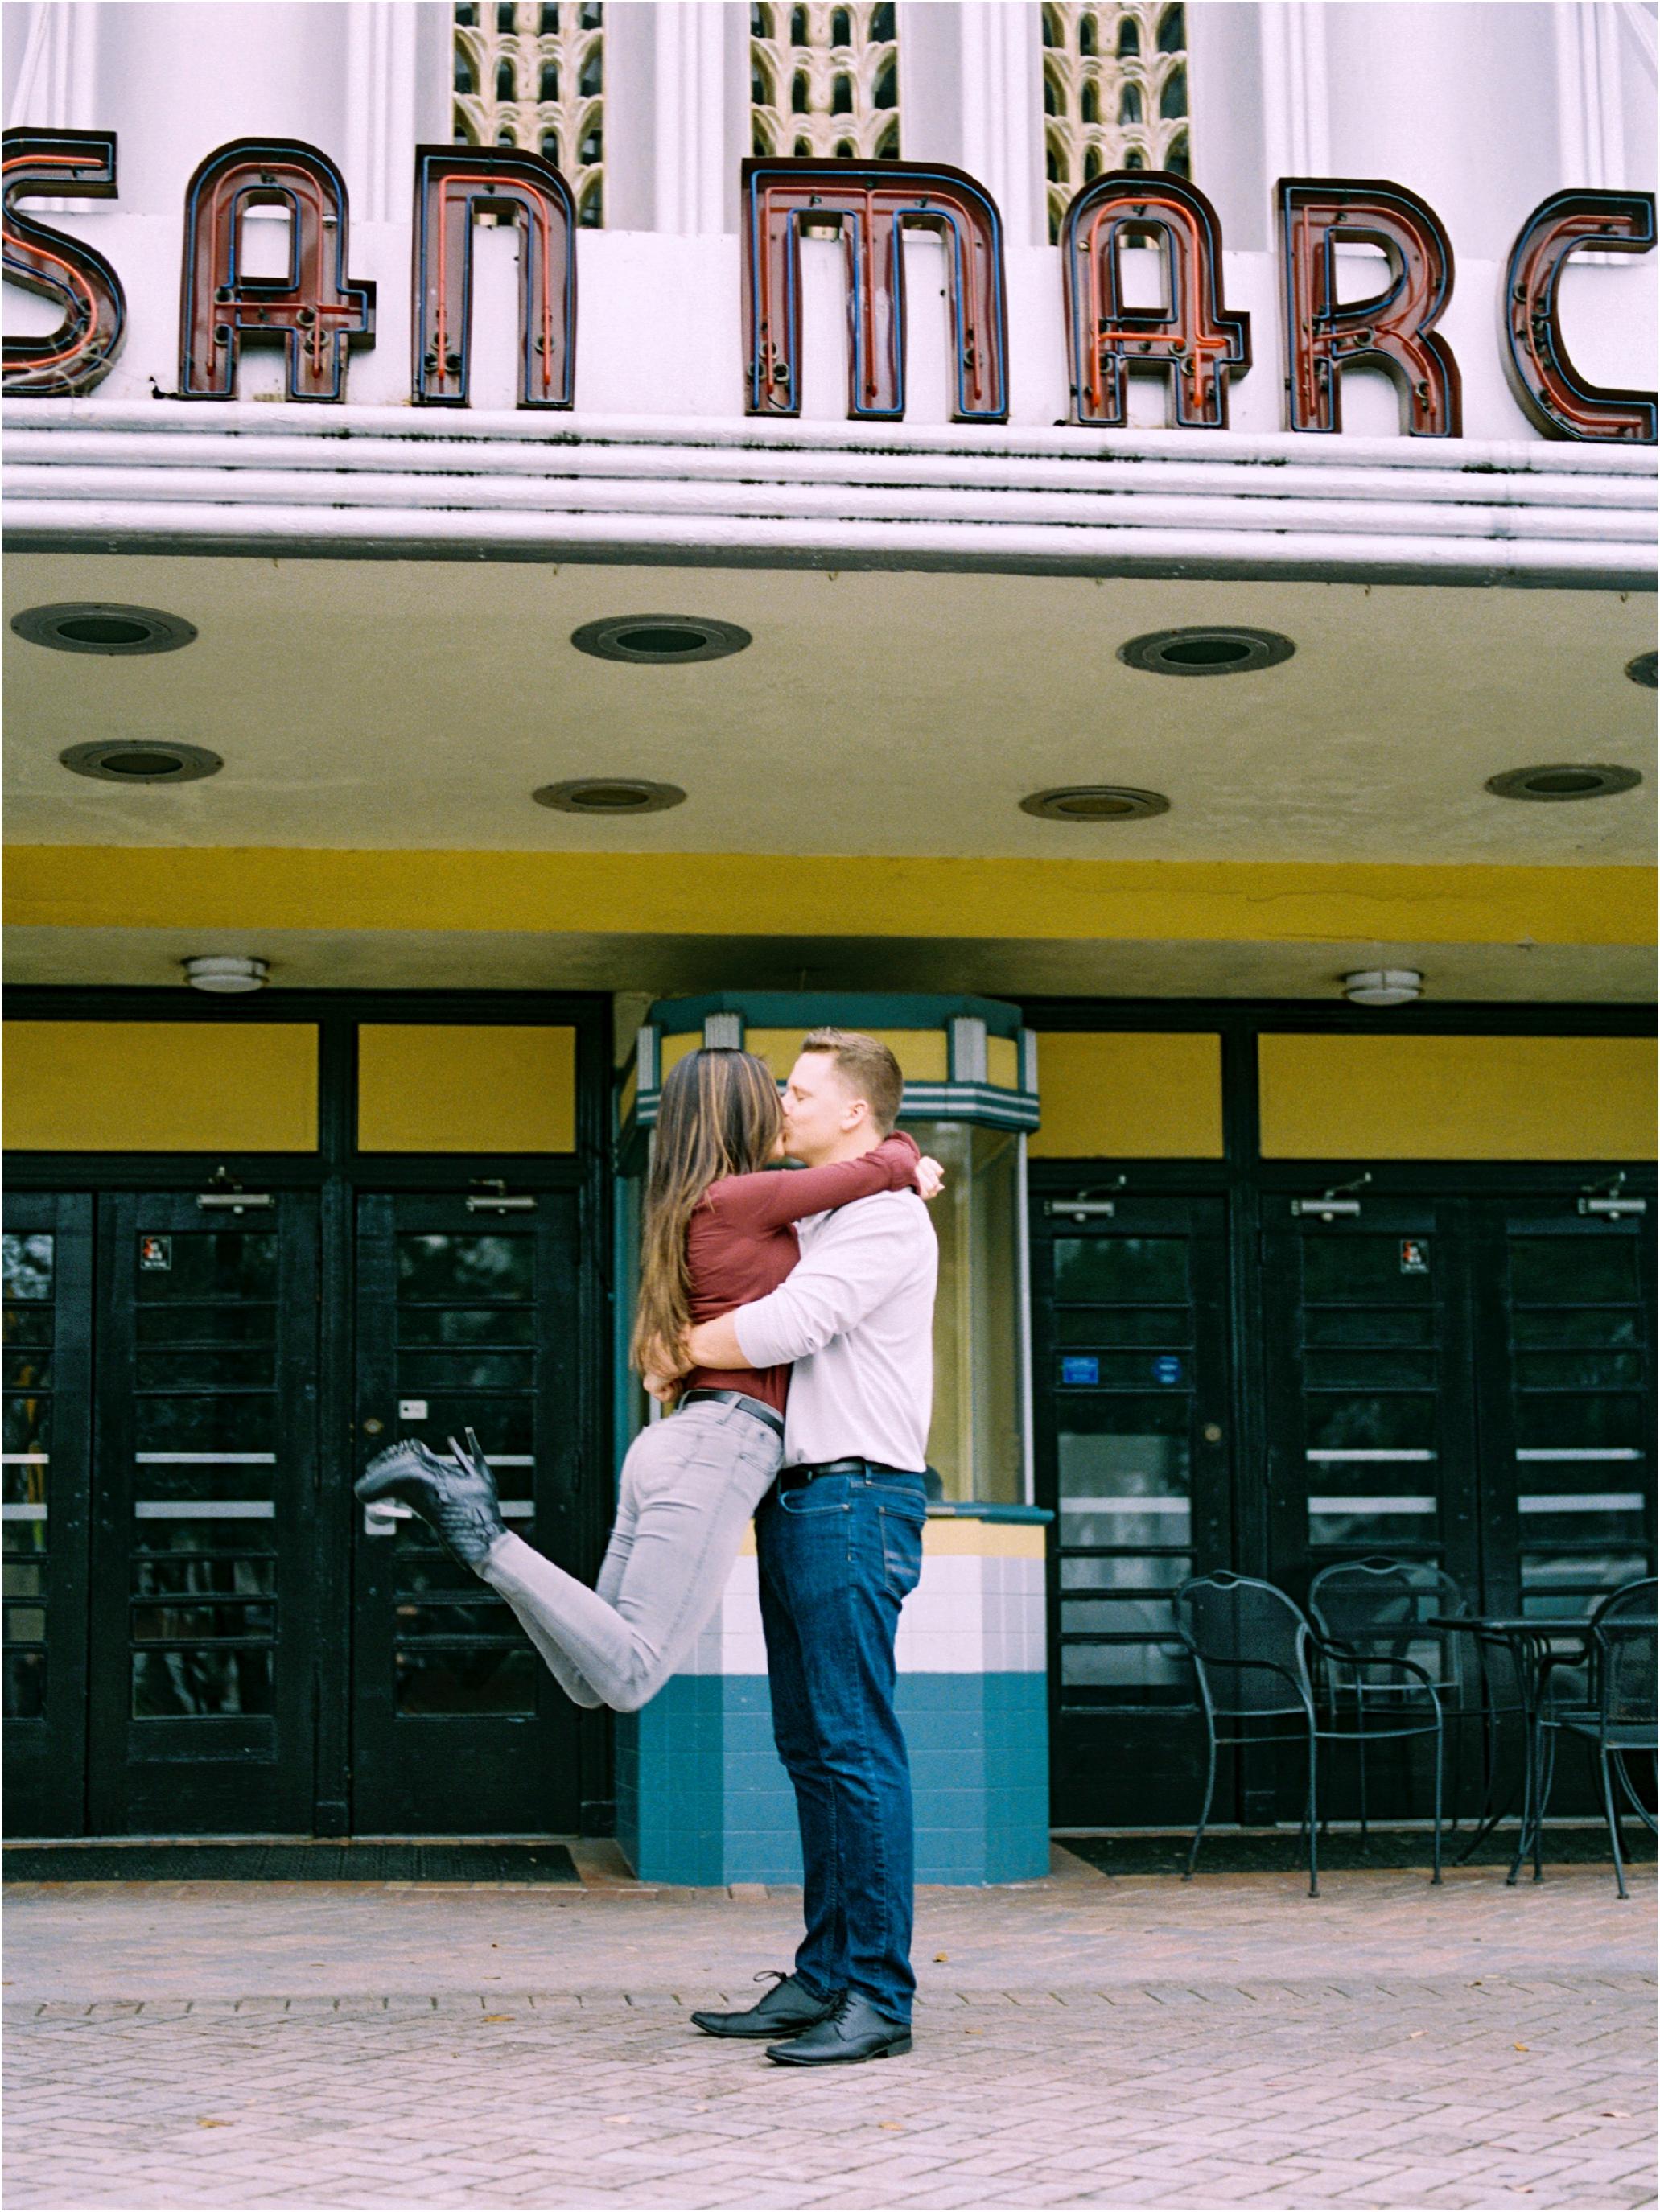 Lisa Silva Photography- Ponte Vedra Beach and Jacksonville, Florida Fine Art Film Wedding Photography- San Marco Jacksonville florida Engagement Session_0021.jpg